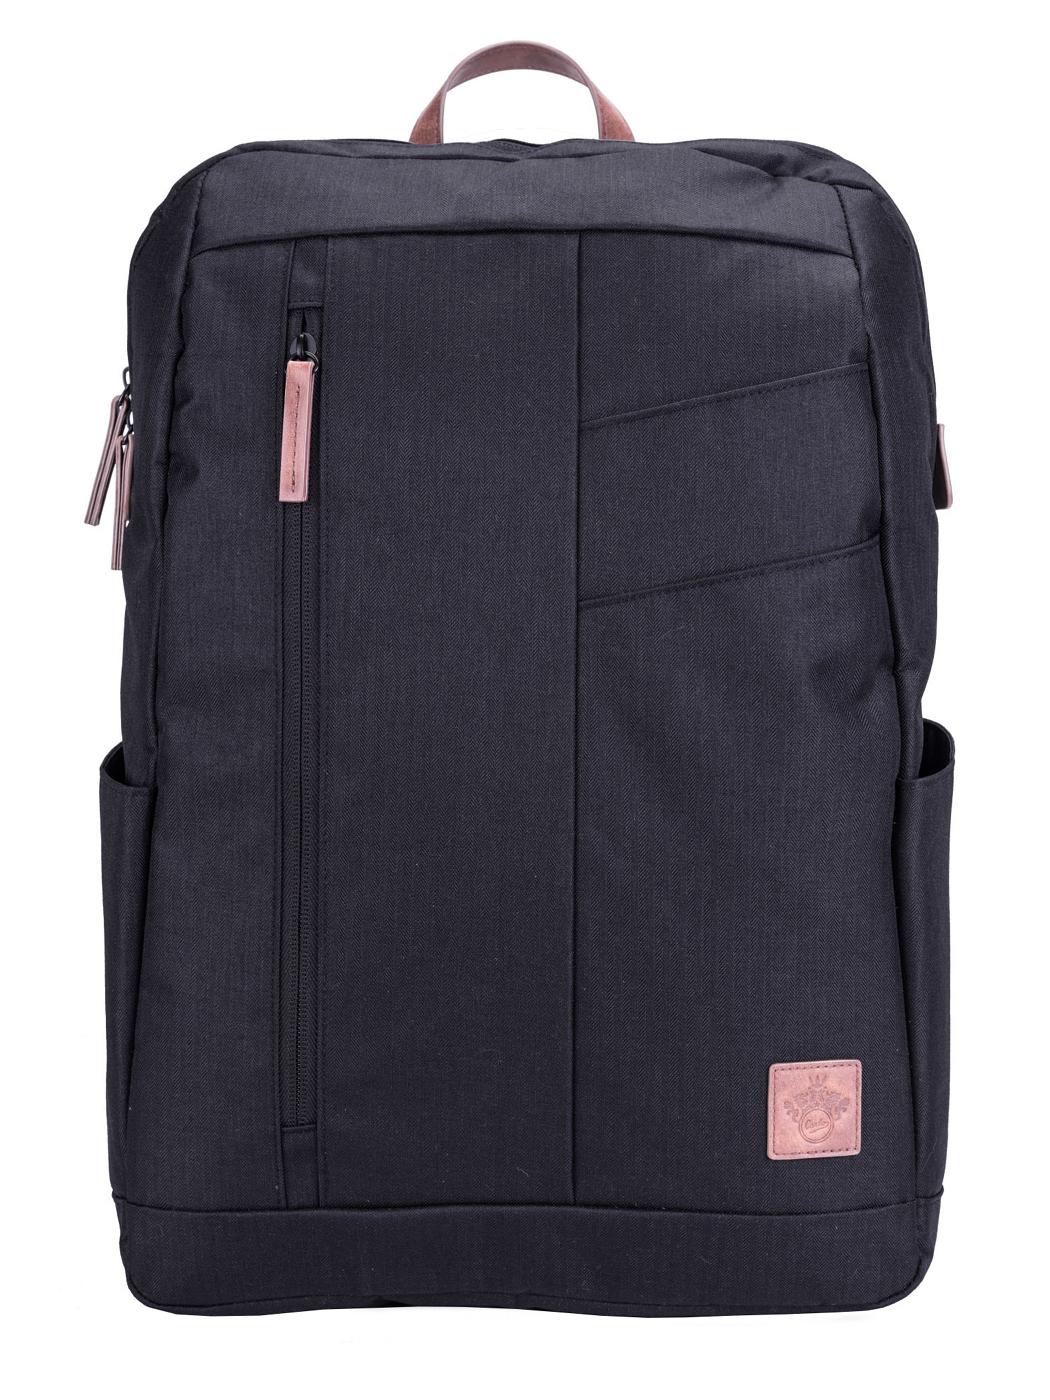 Lund ryggsäck